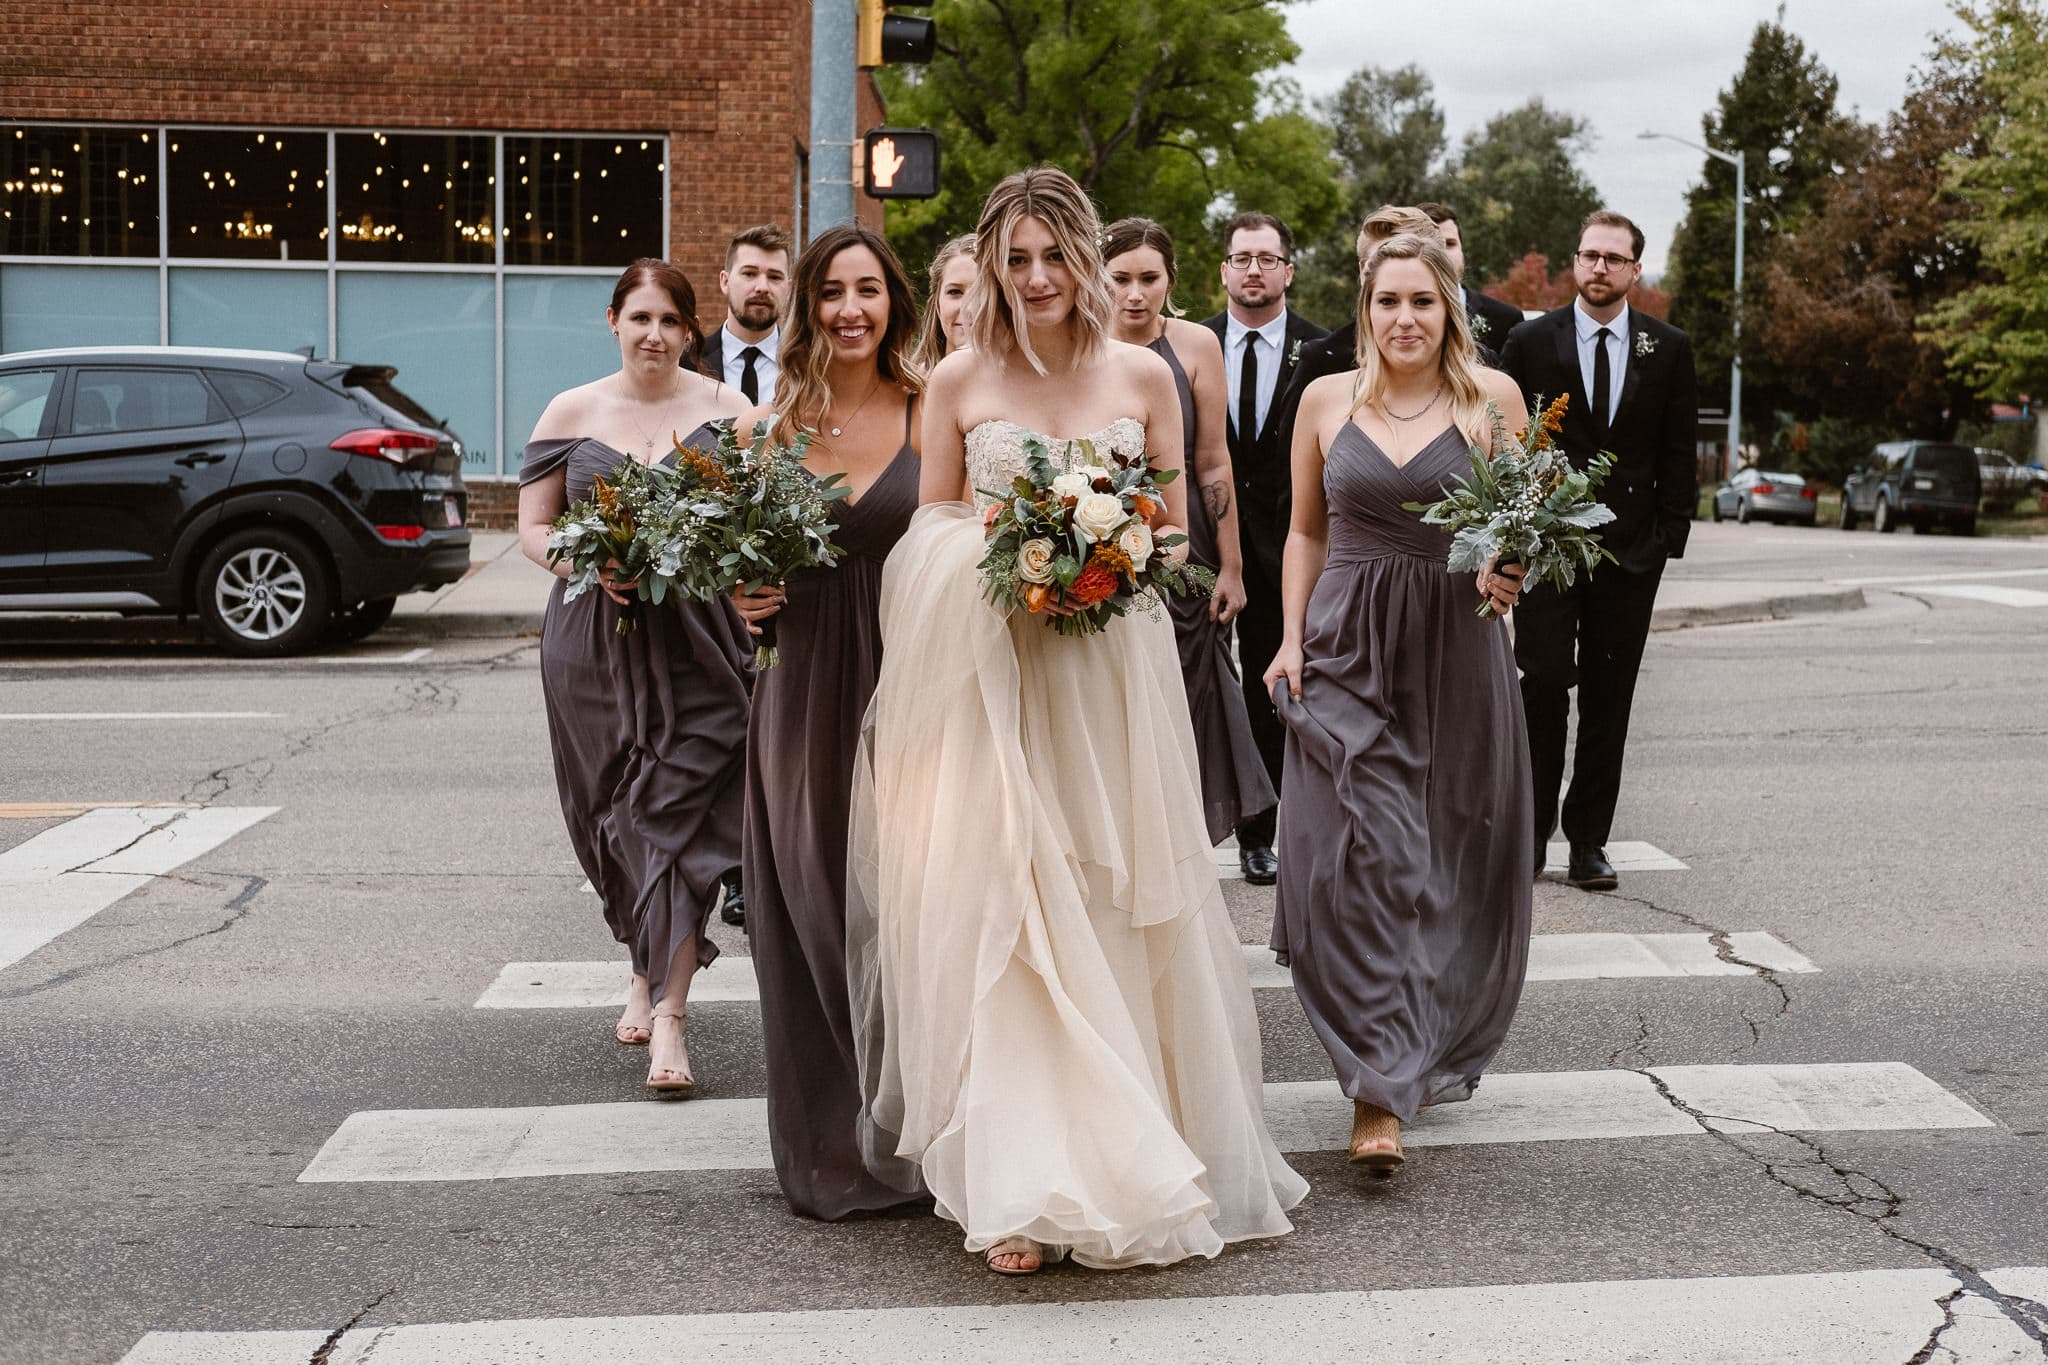 St Vrain Wedding Photographer | Longmont Wedding Photographer | Colorado Winter Wedding Photographer, Colorado industrial chic wedding, bride with bridesmaids, Marchesa wedding dress, gray bridesmaid dresses